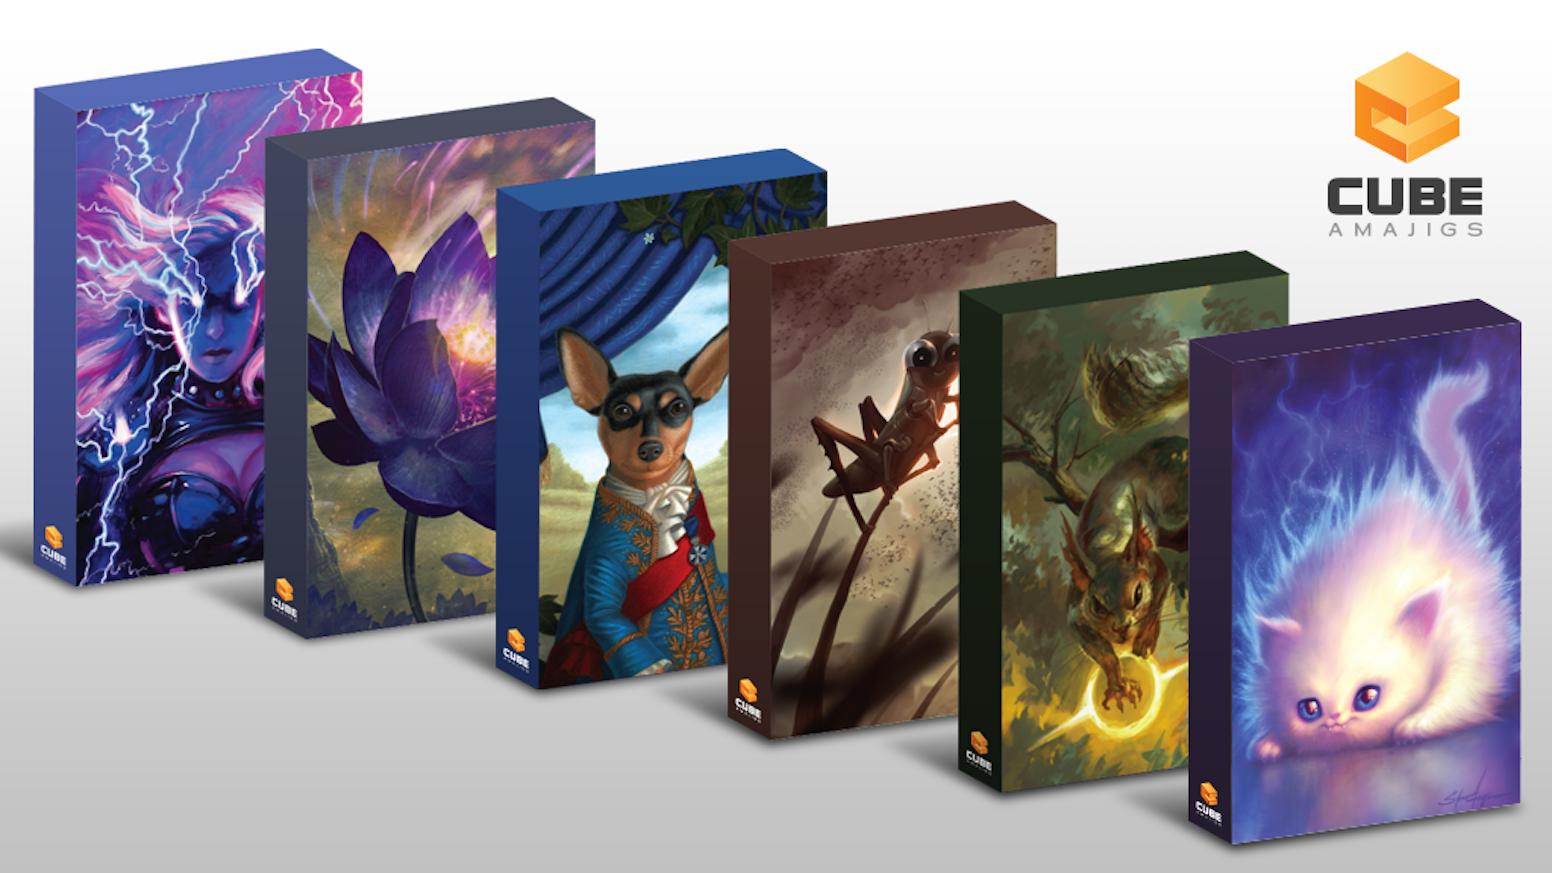 Cubeamajigs Reusable Gaming Packs By Hit Point Press Kickstarter